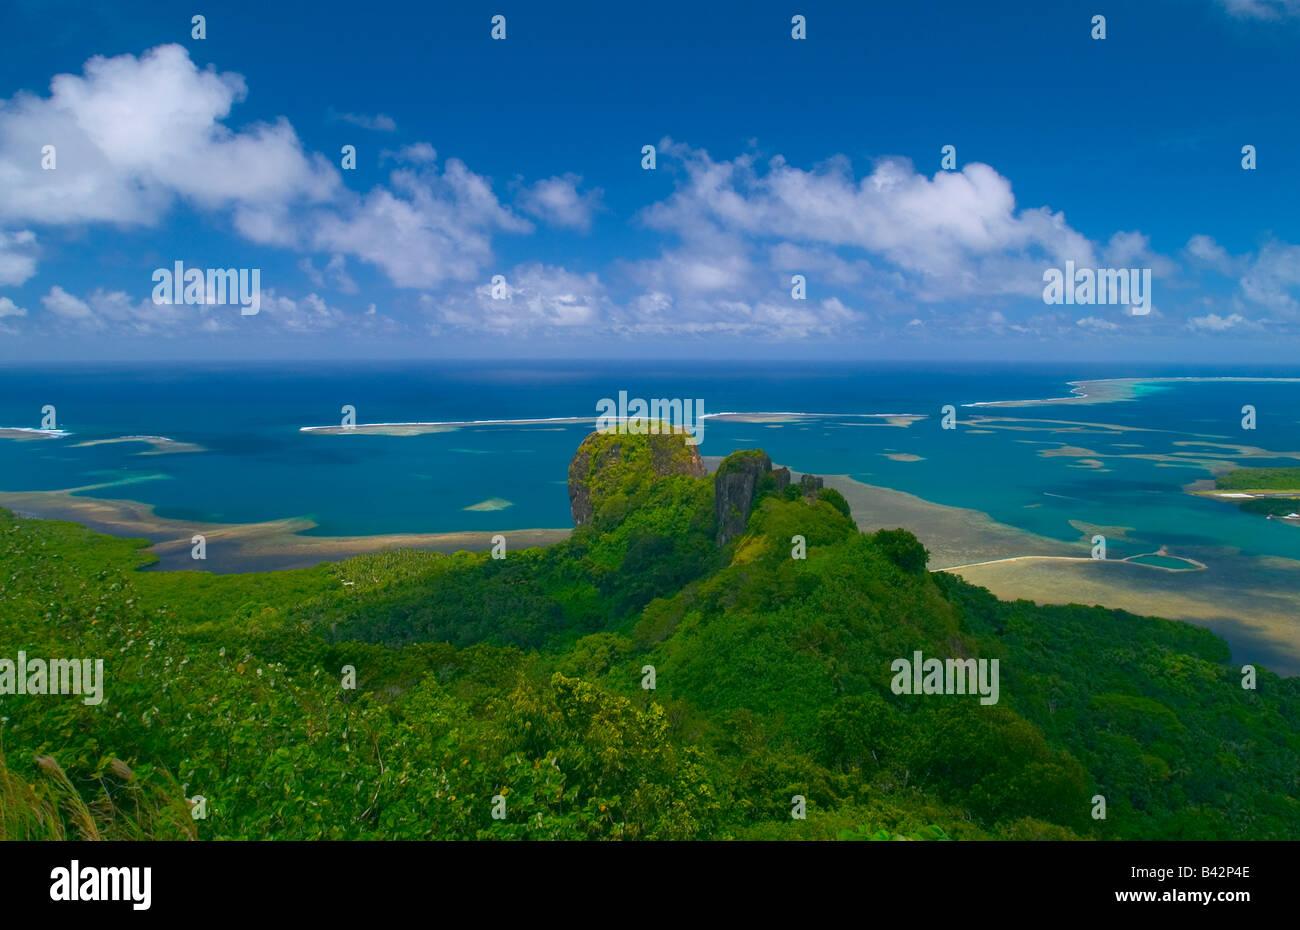 Pohnpei Island Caroline Islands Senyavin Islands Pacific Pohnpei Micronesia - Stock Image